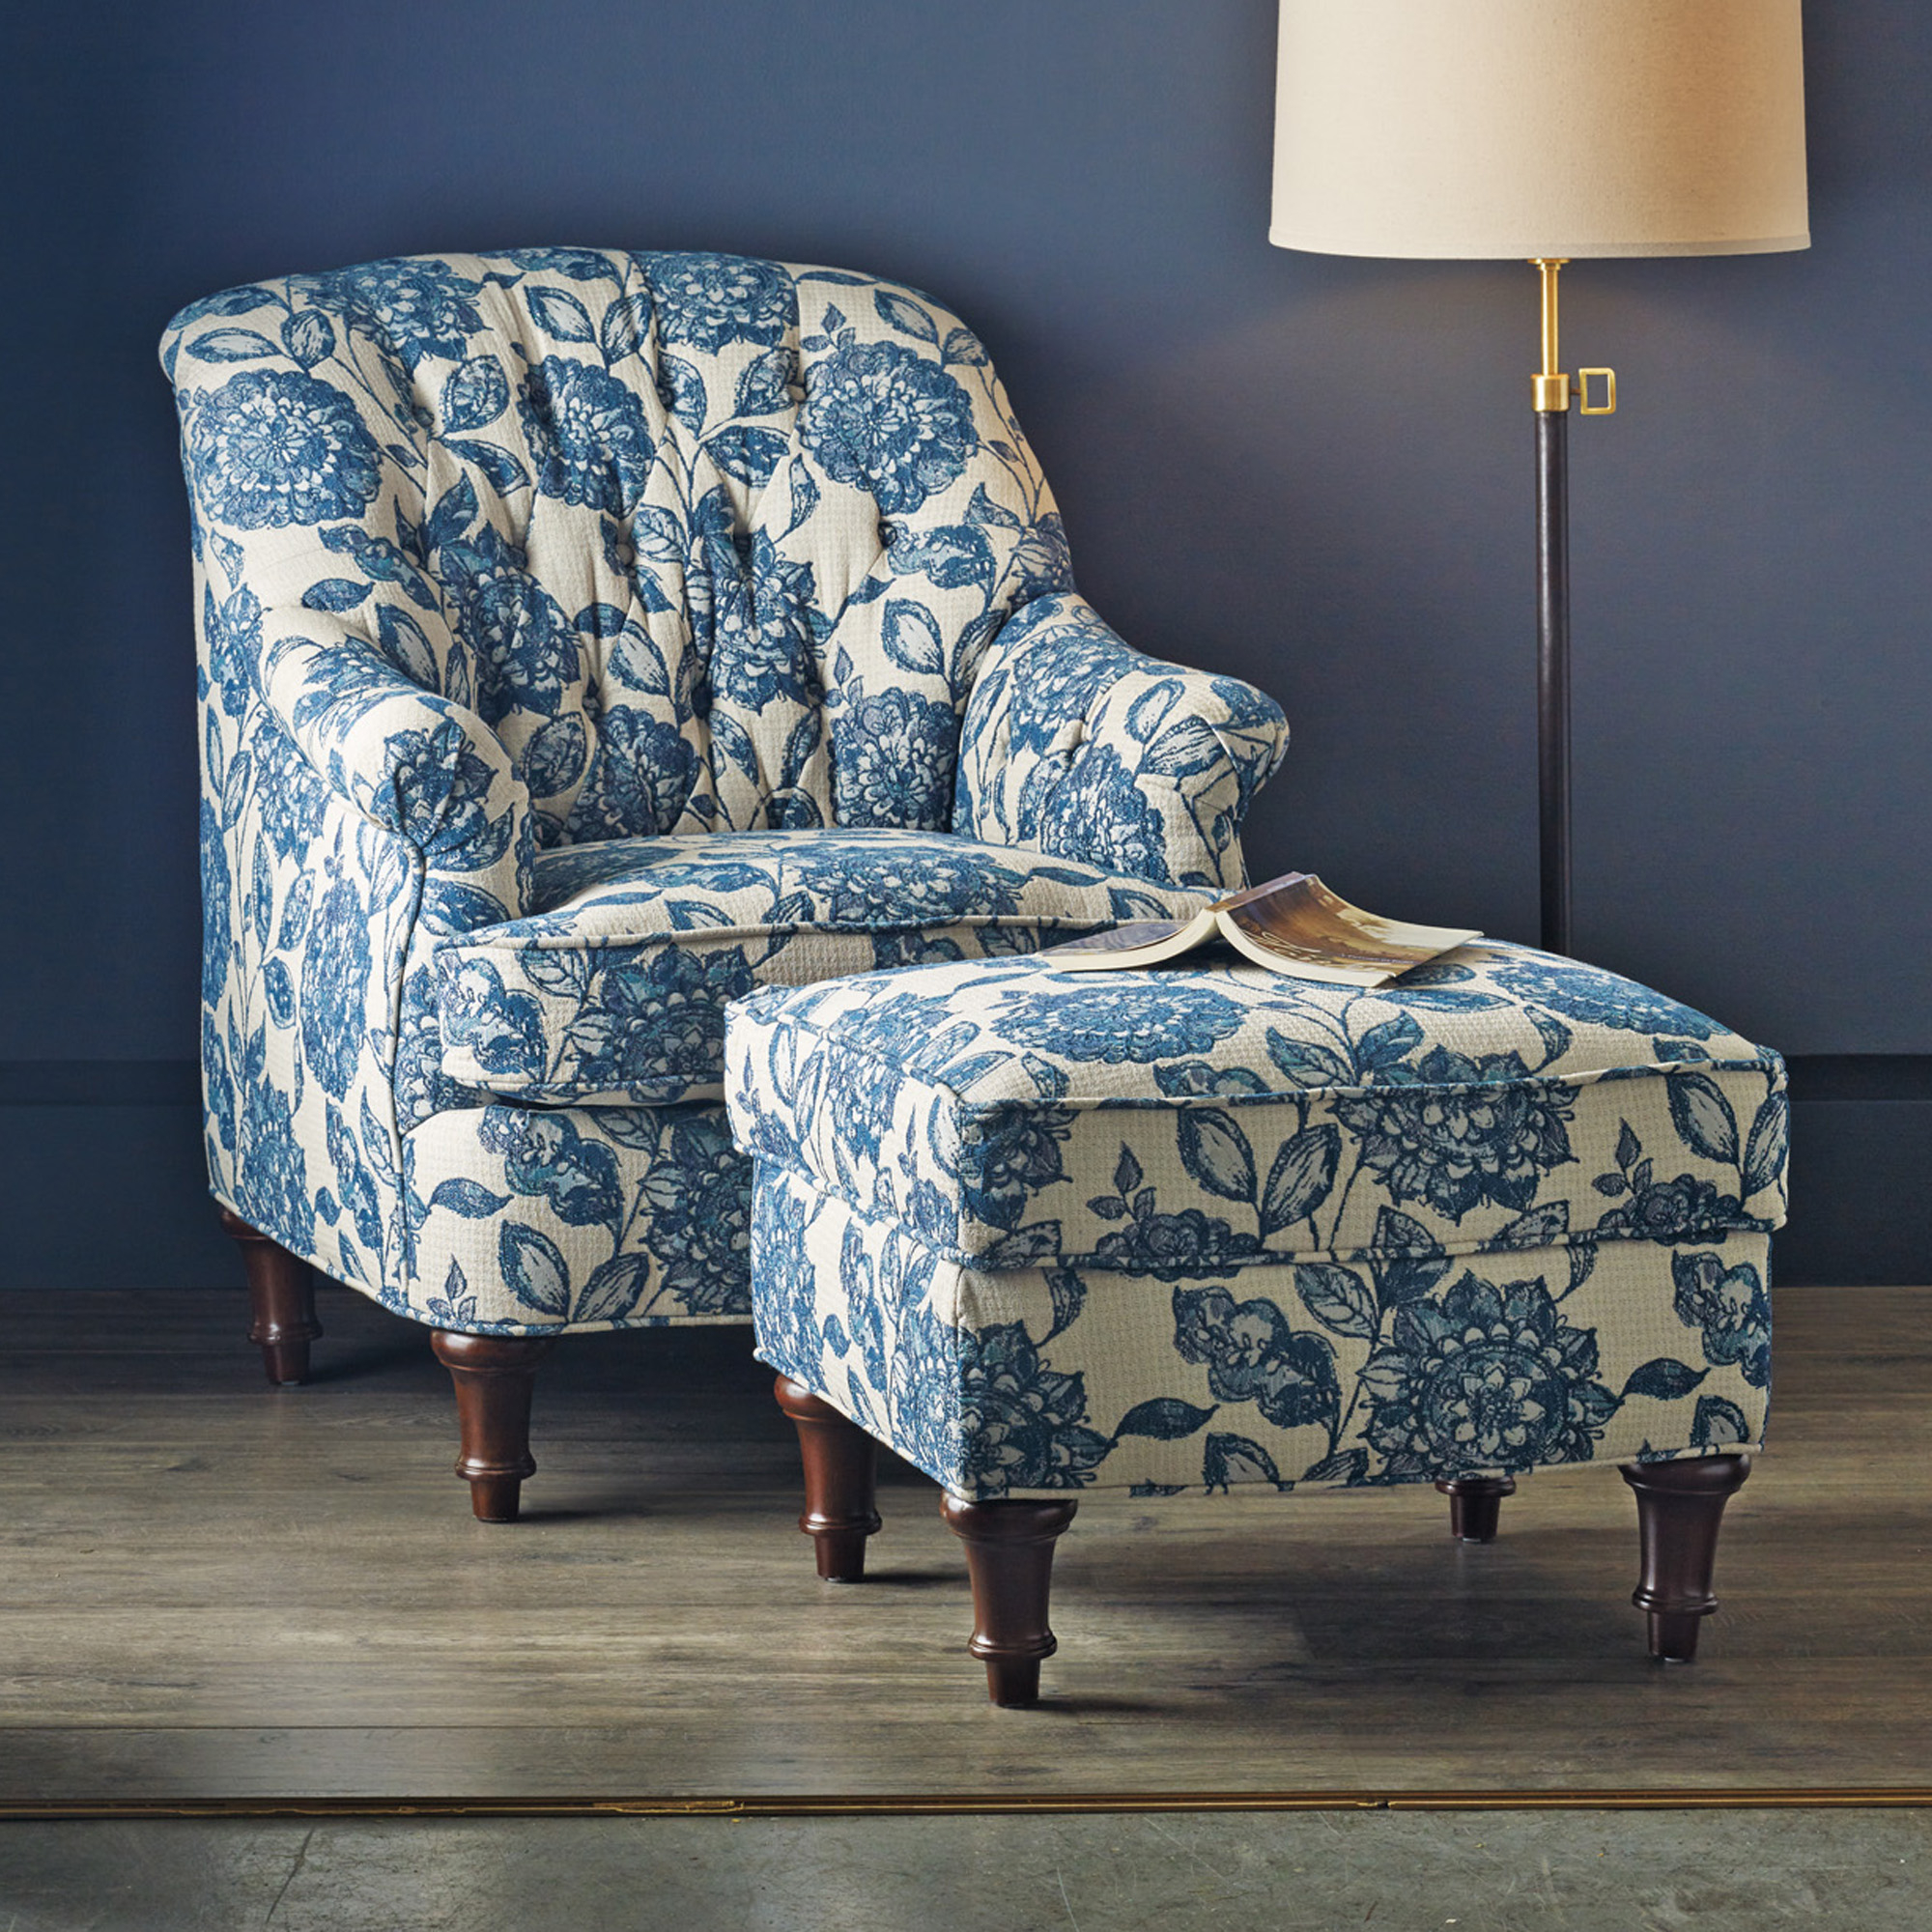 blue floral chair lightweight beach chairs uk kendall and ottoman gump 39s